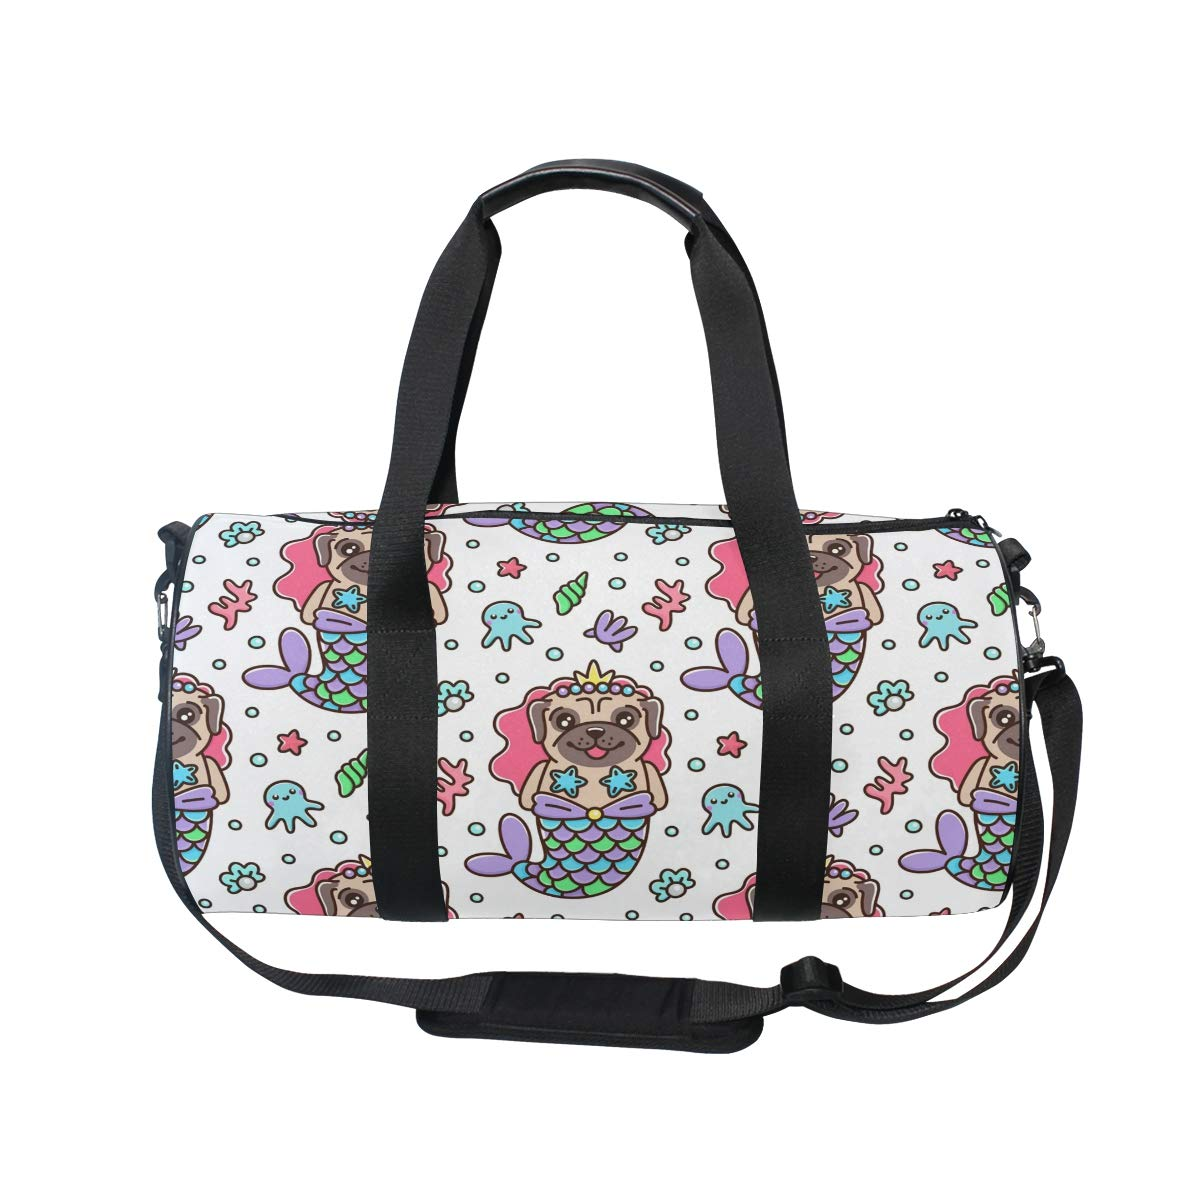 WIHVE Gym Duffel Bag Dog Pug Mermaid Octopus Starfish Sports Lightweight Canvas Travel Luggage Bag